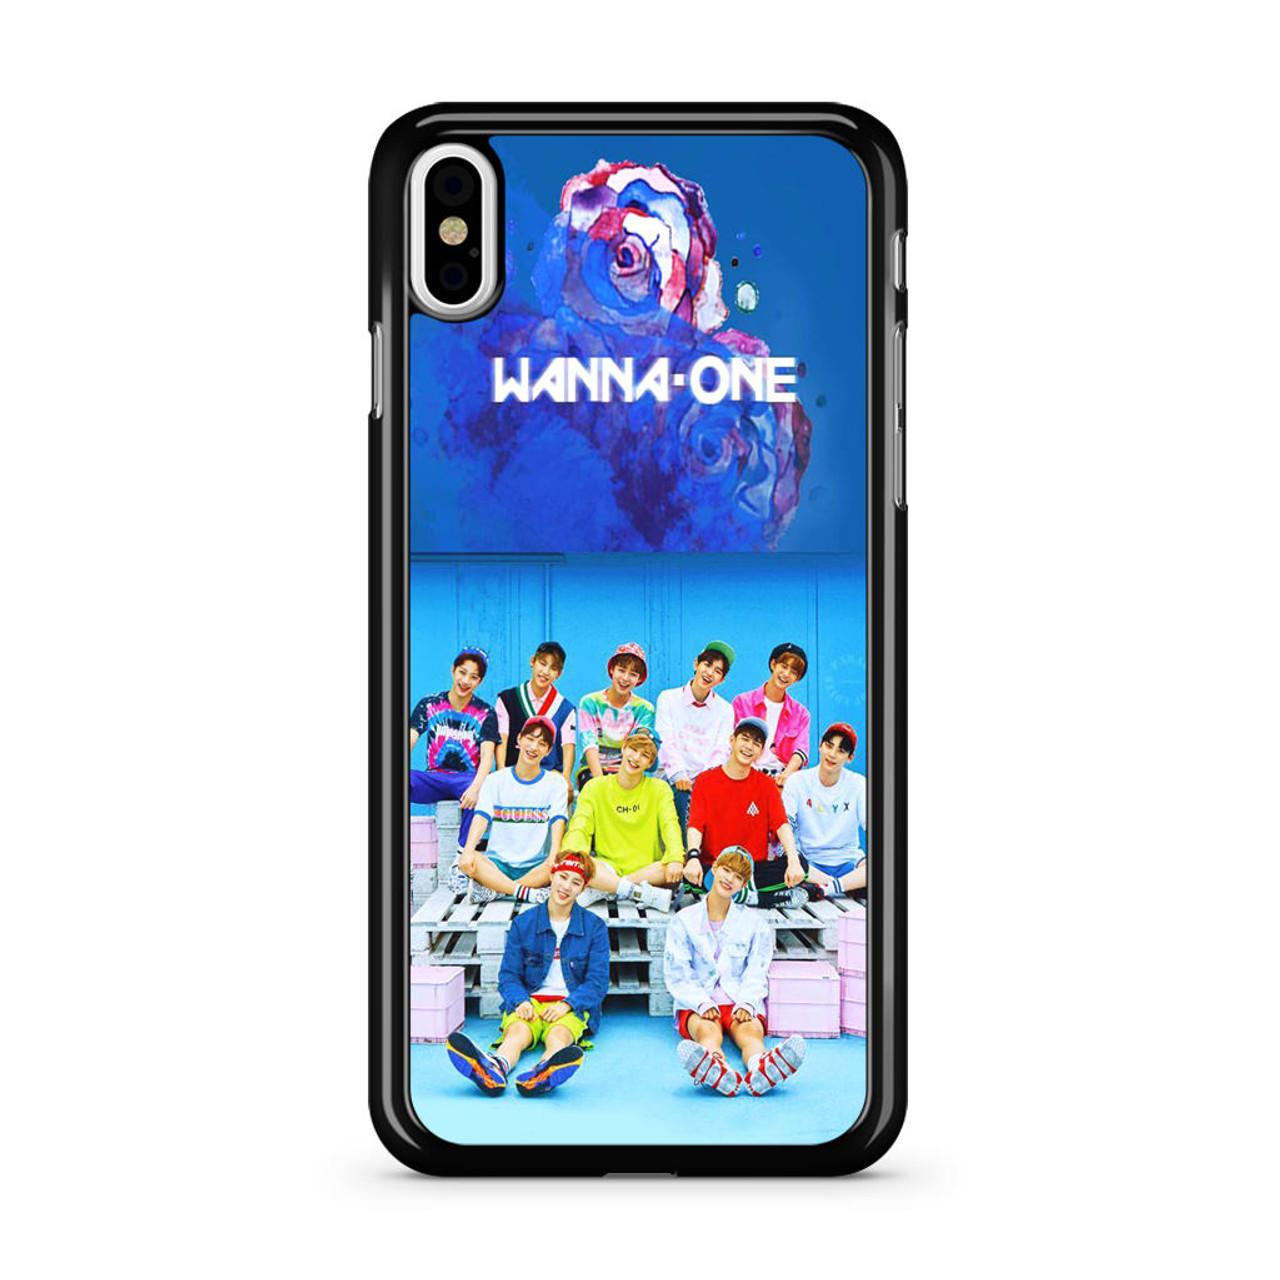 e151ff19f6ff Wanna One iPhone XS Max Case - GGIANS